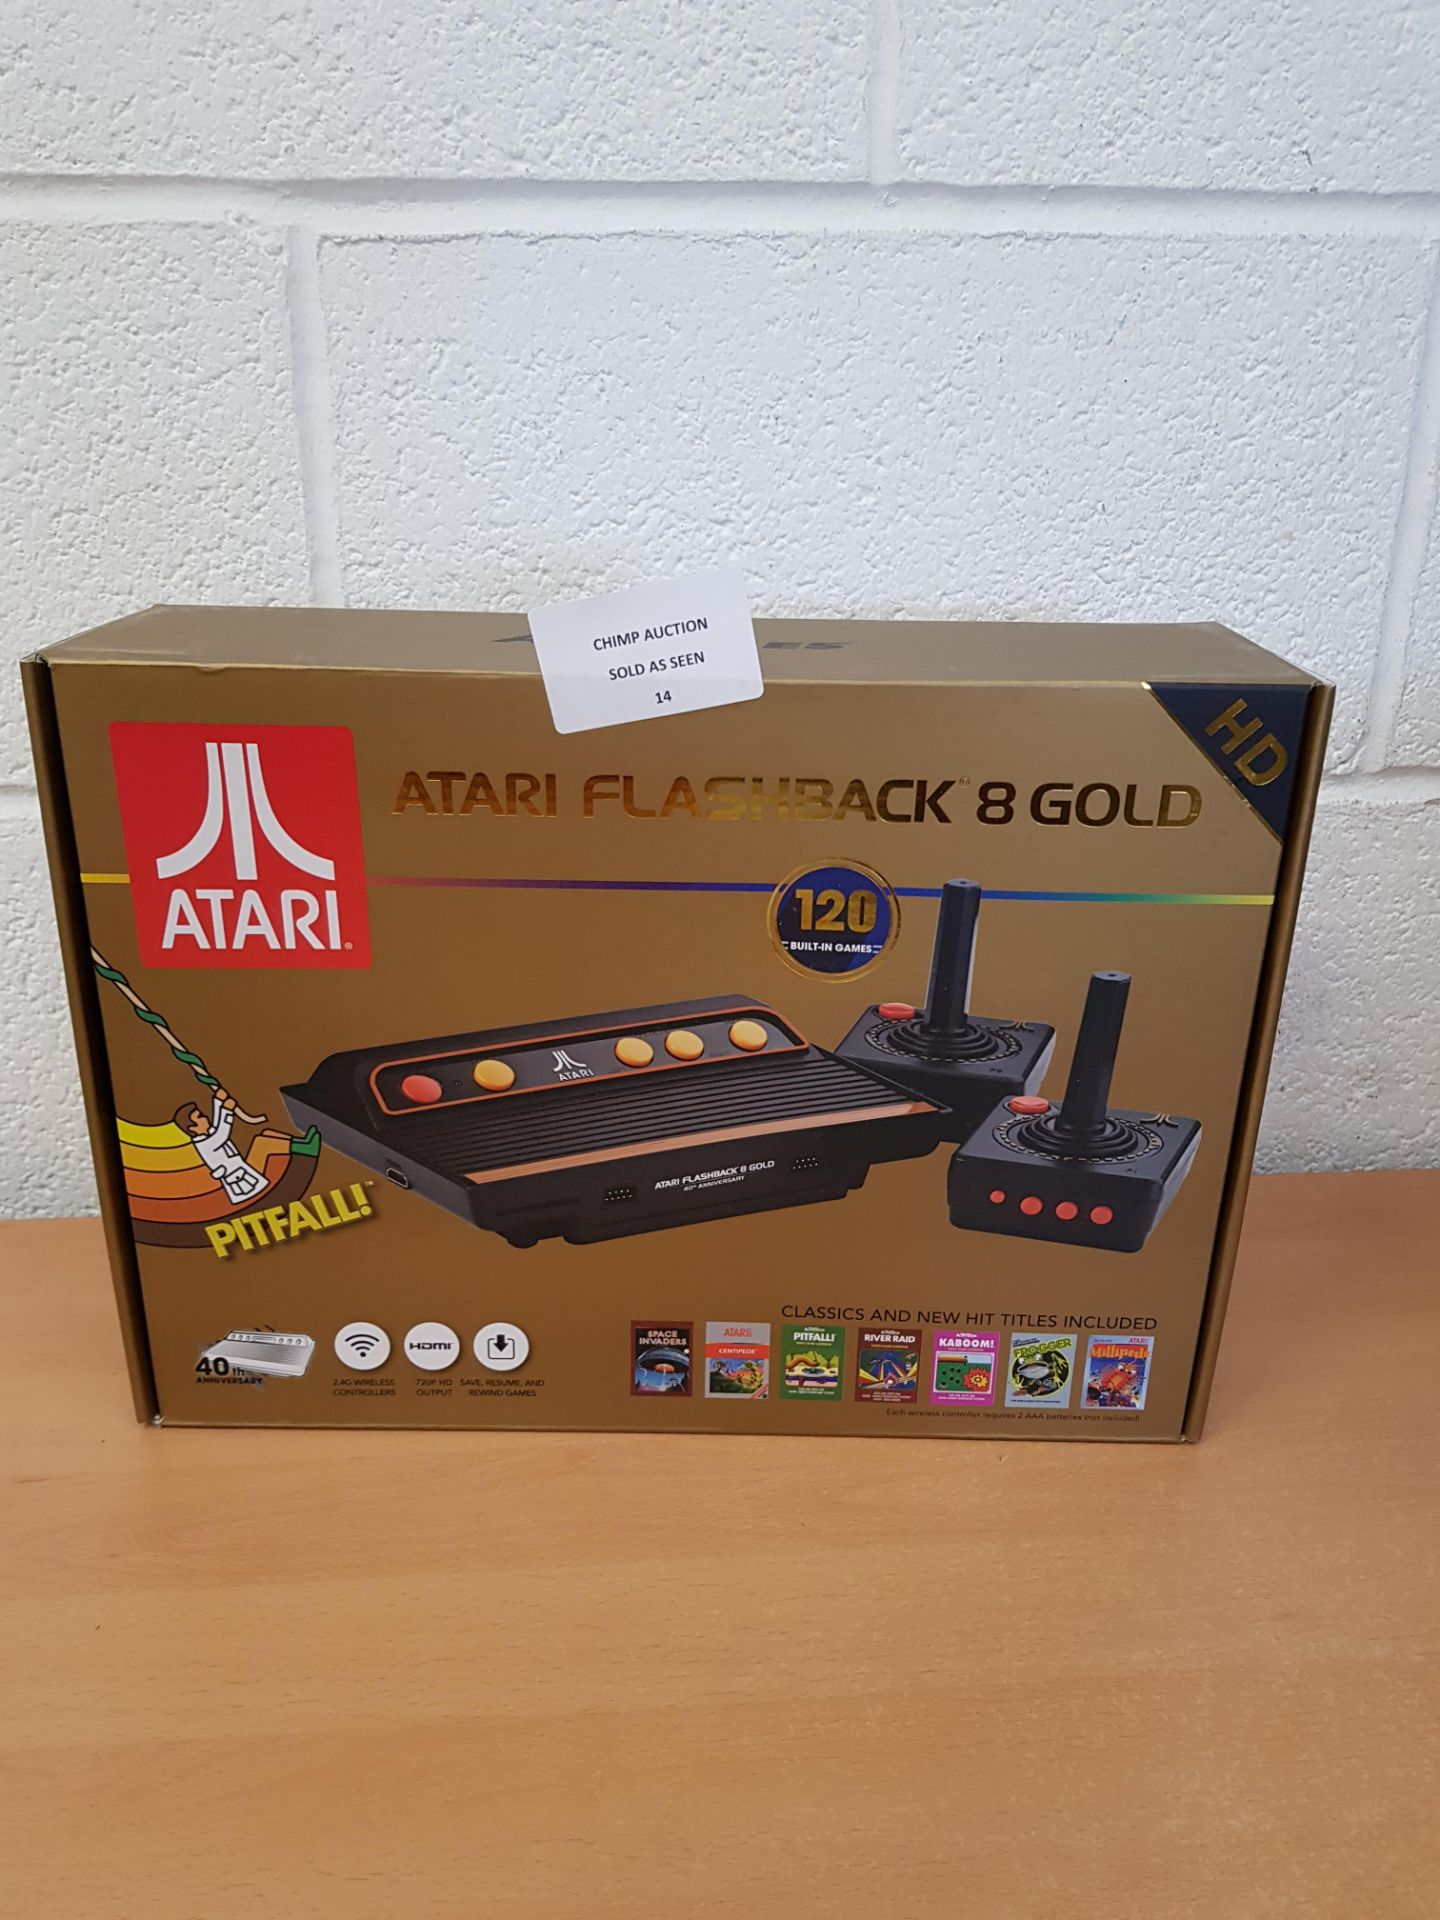 Atari Flashback 8 Gold HD retro Console + 120 Games RRP £79.99.